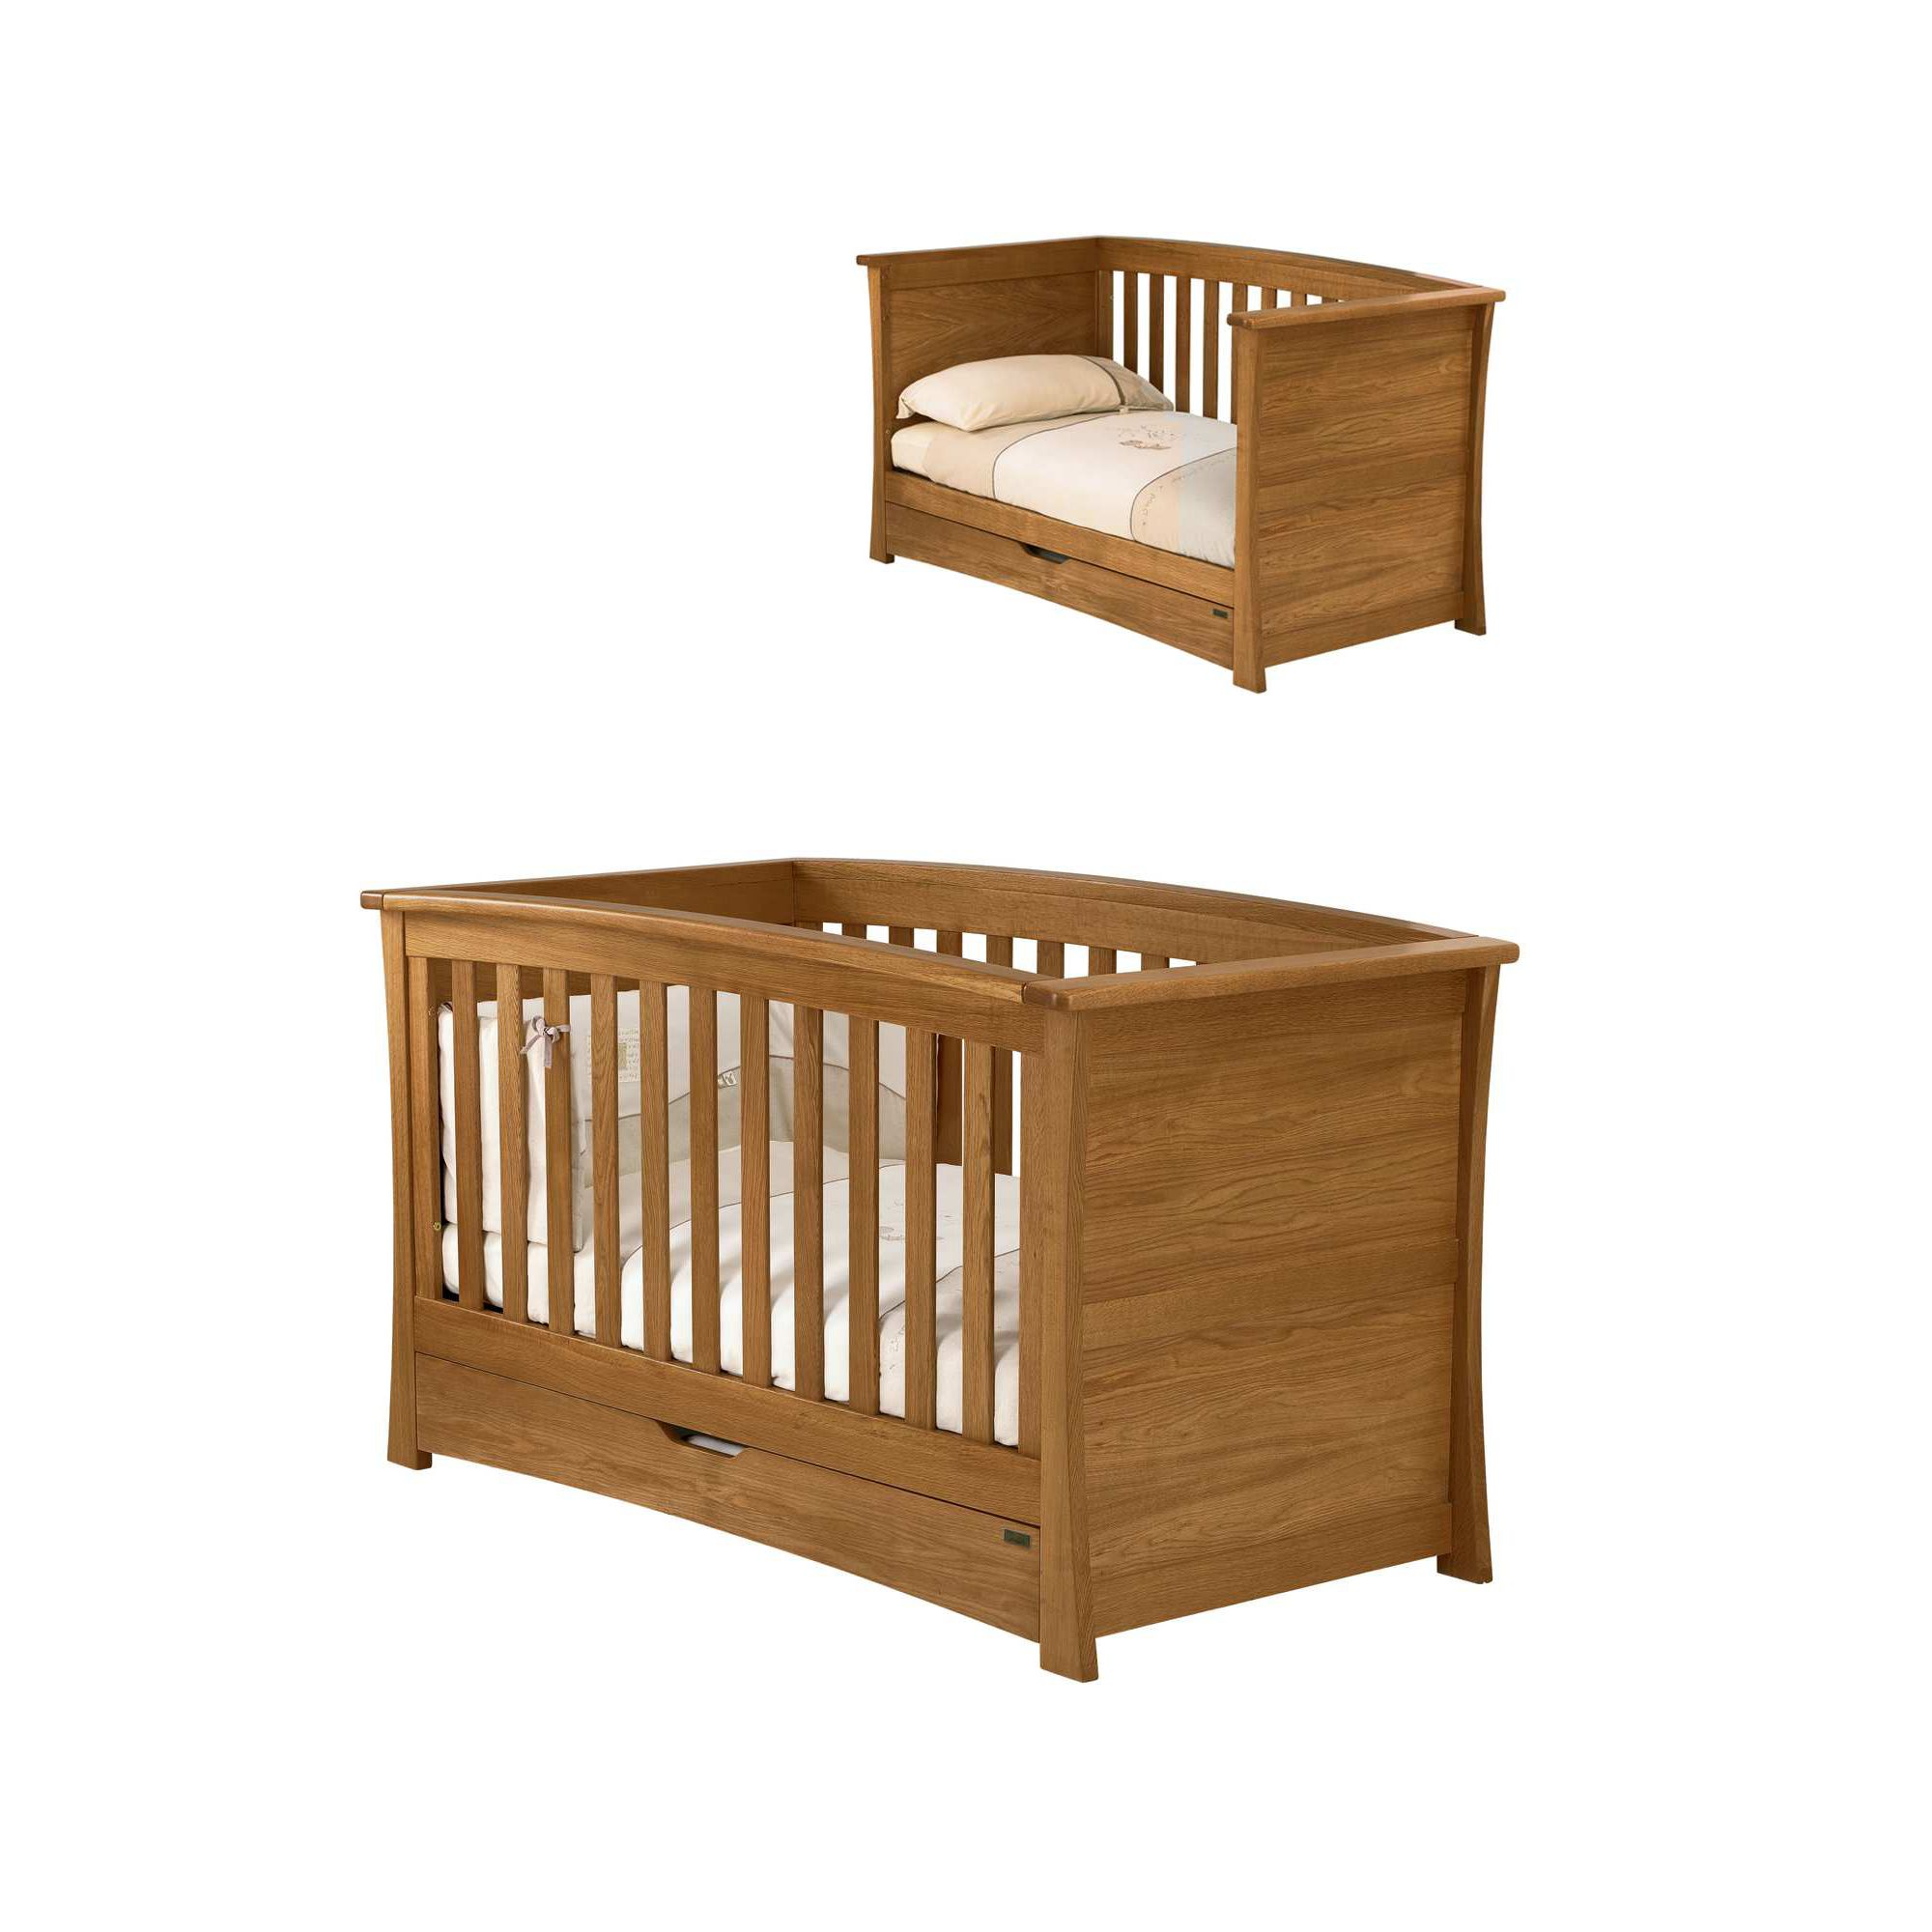 Mamas & Papas - Ocean Cot/Day Bed - Dark Oak at Tesco Direct